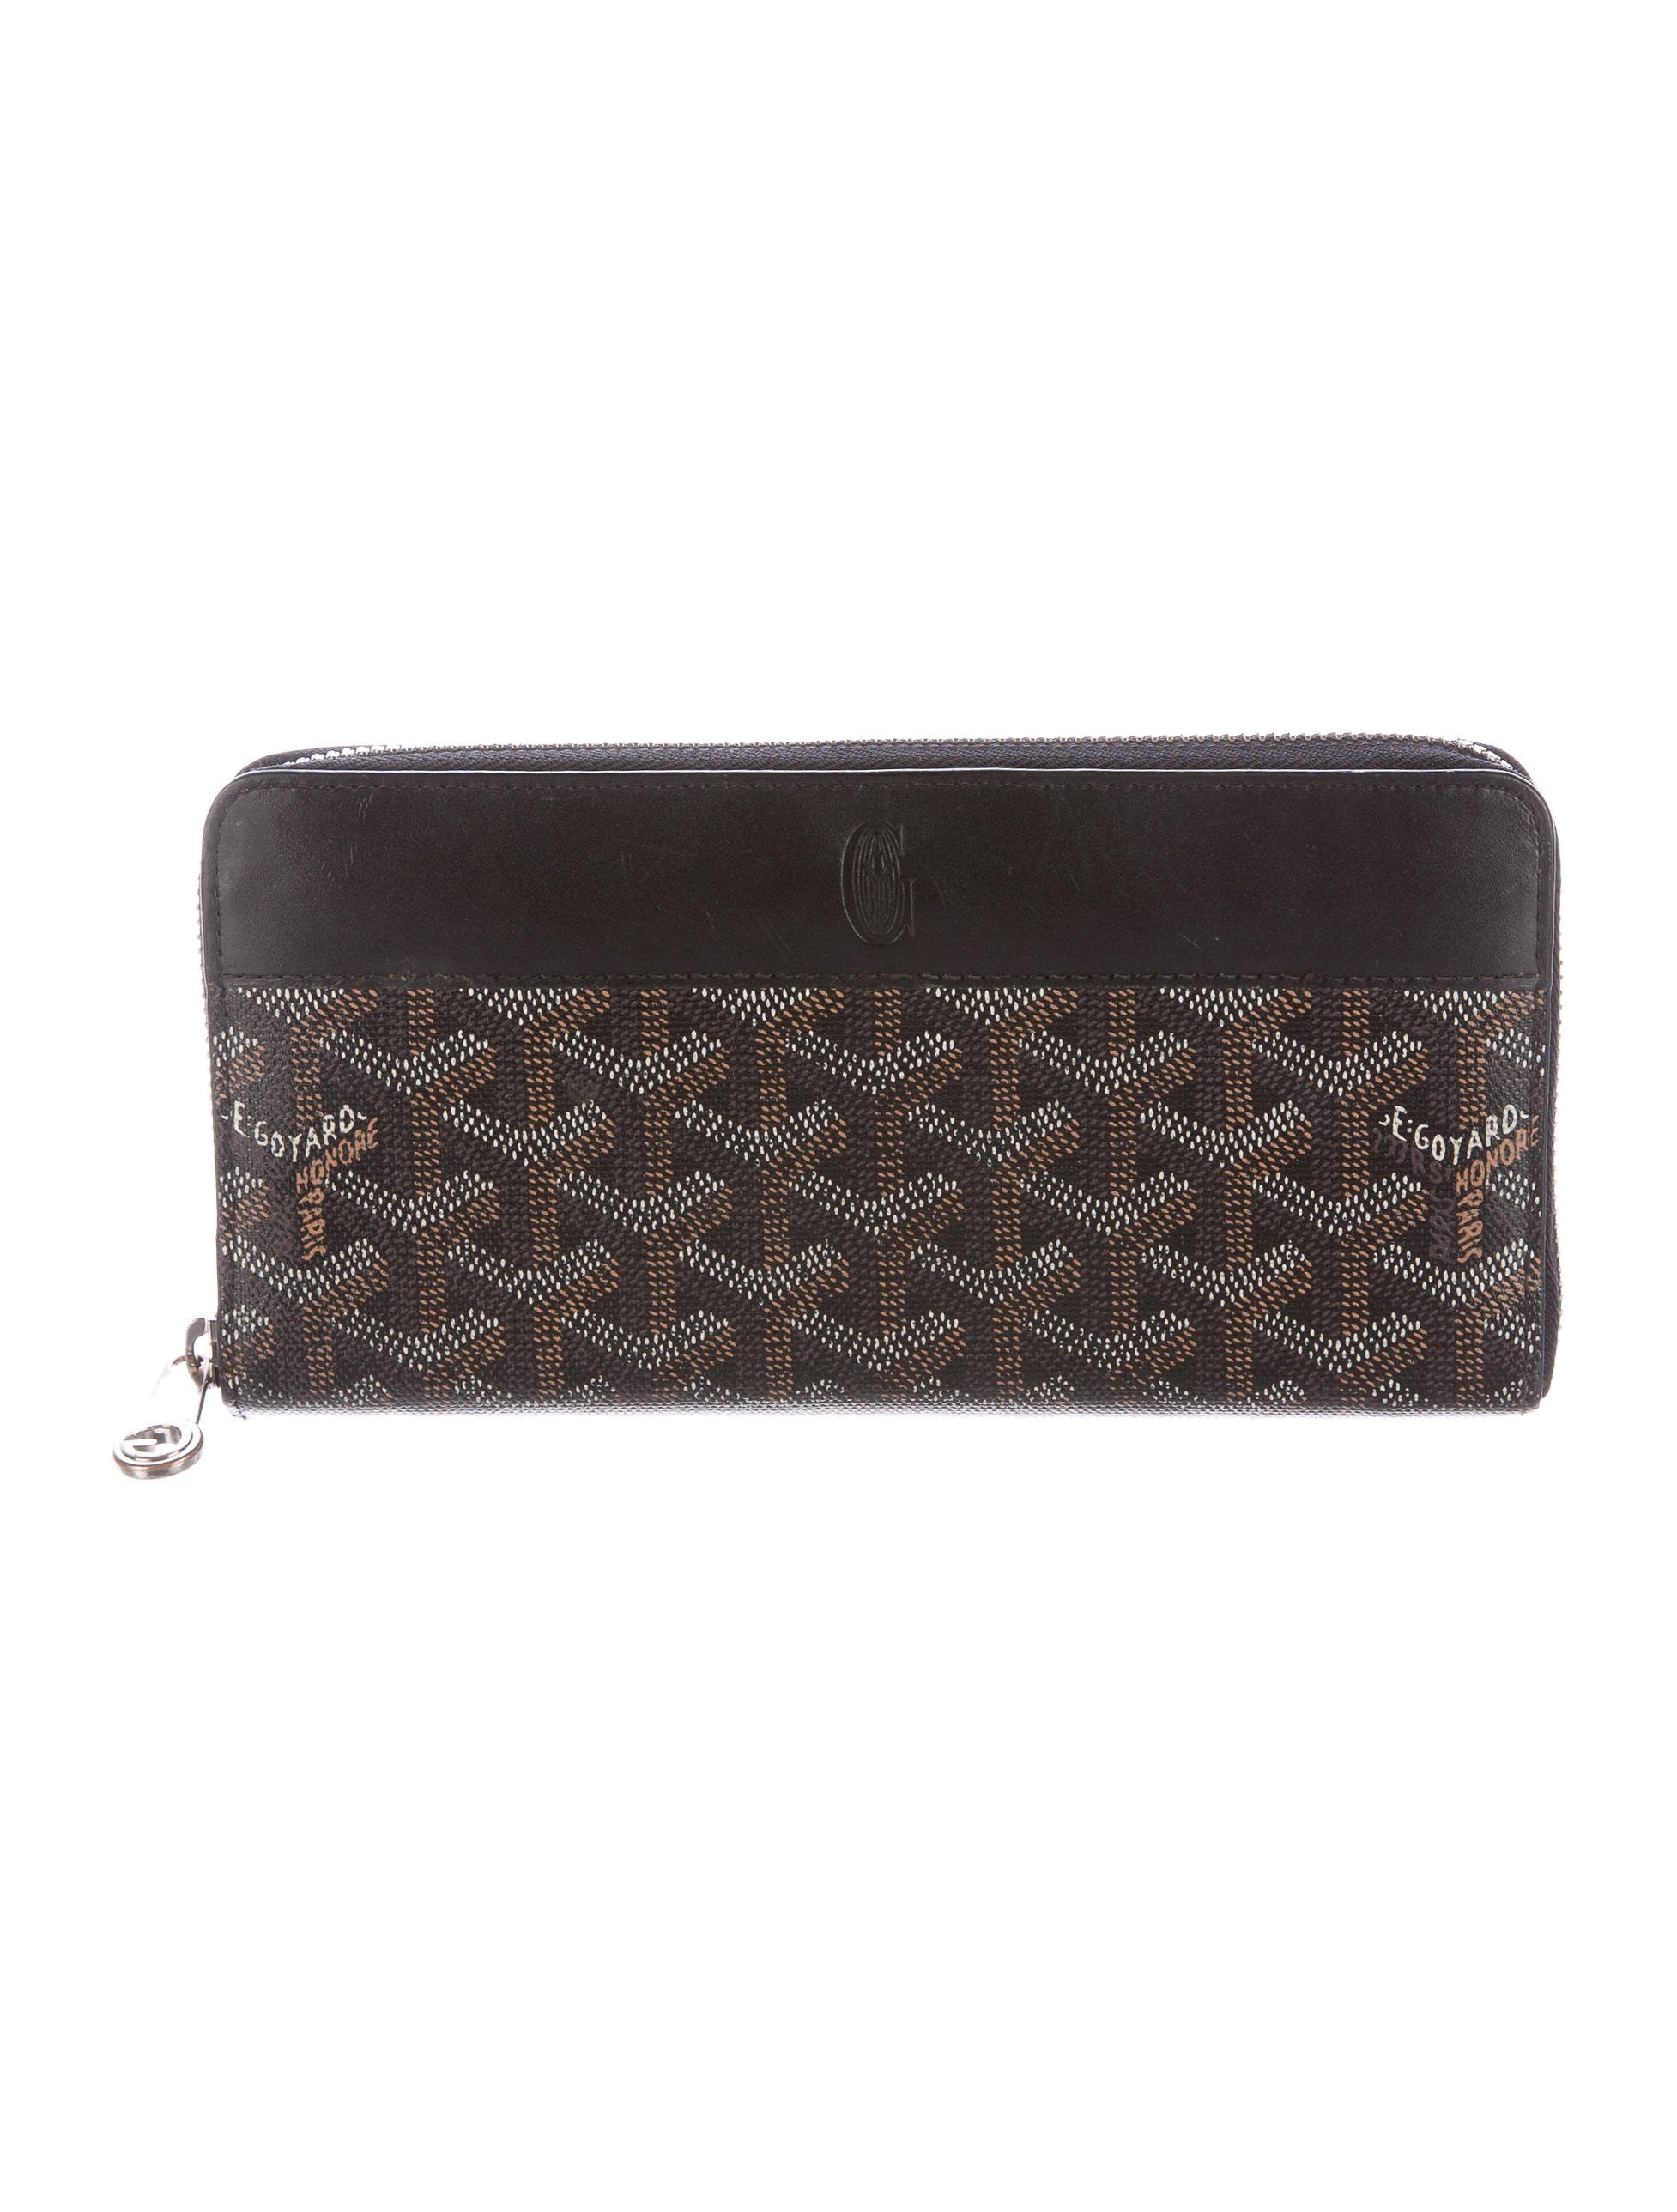 Goyard Matignon Wallet Monogram Chevron Zip-around Black